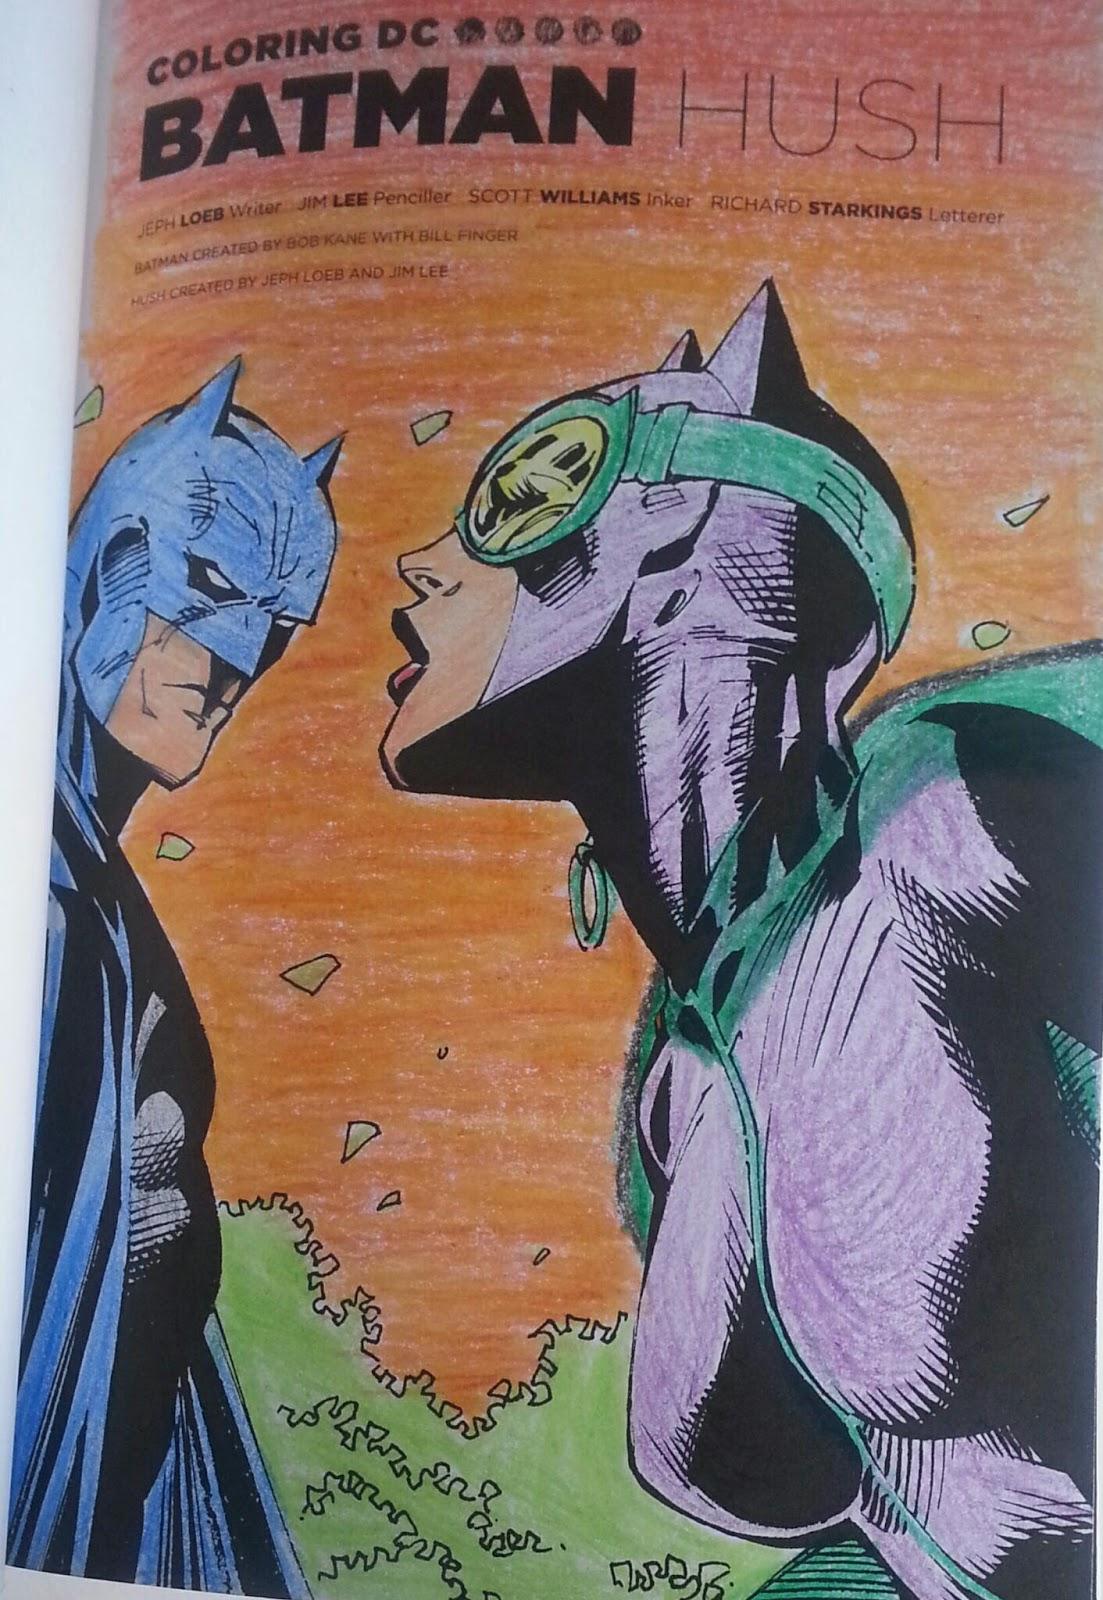 Comic Book Rehab Art Therapy Batman Hush Coloring Part 1